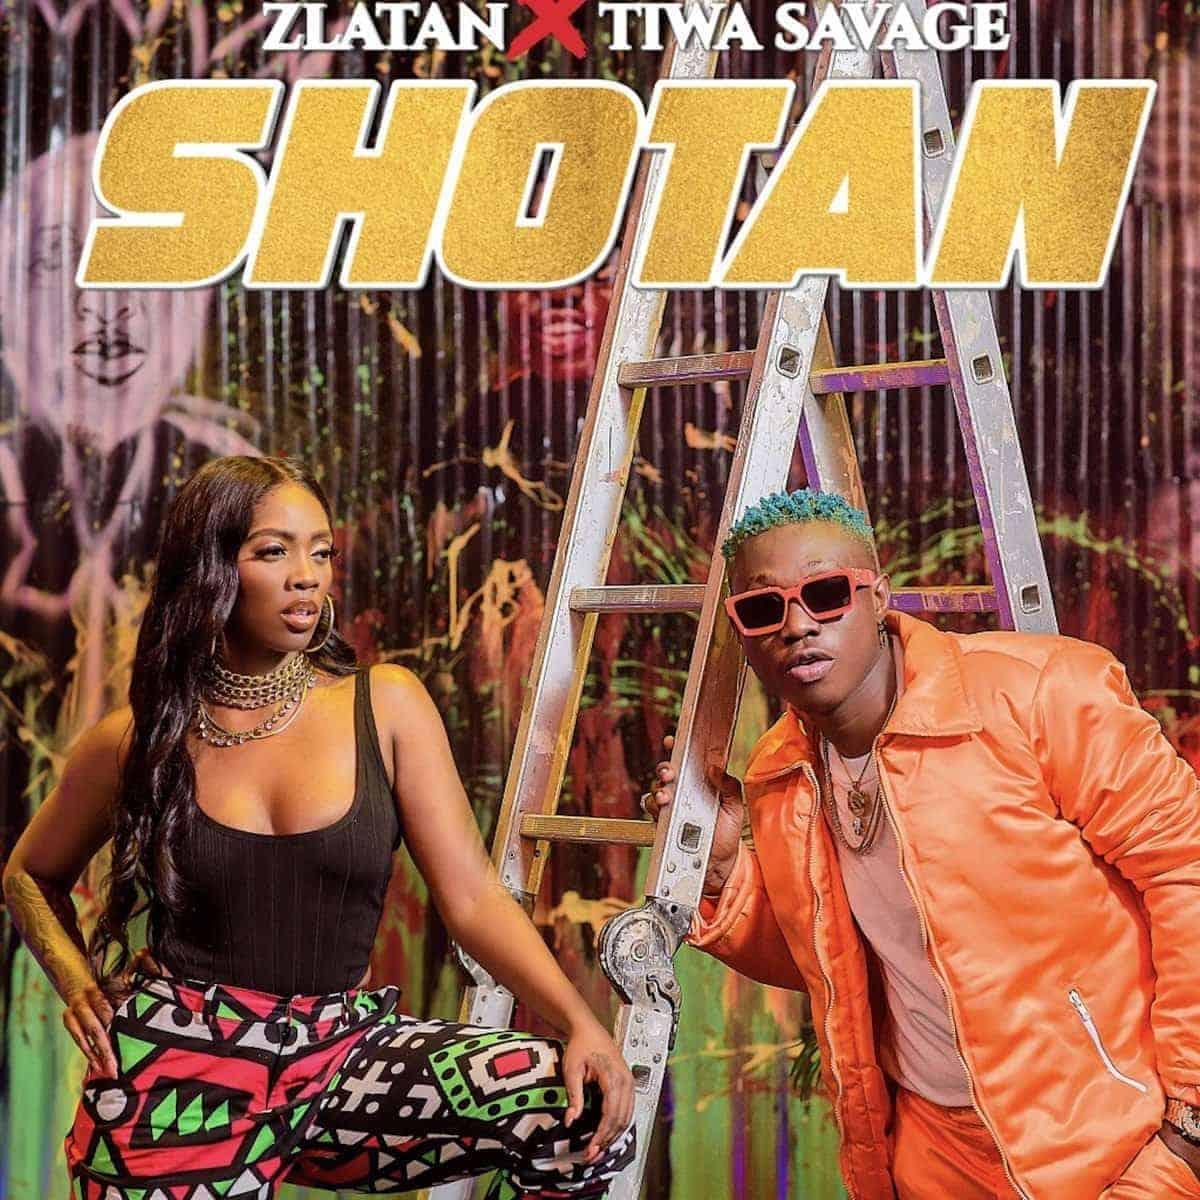 download mp3 zlatan ft tiwa savage - shotan mp3 download